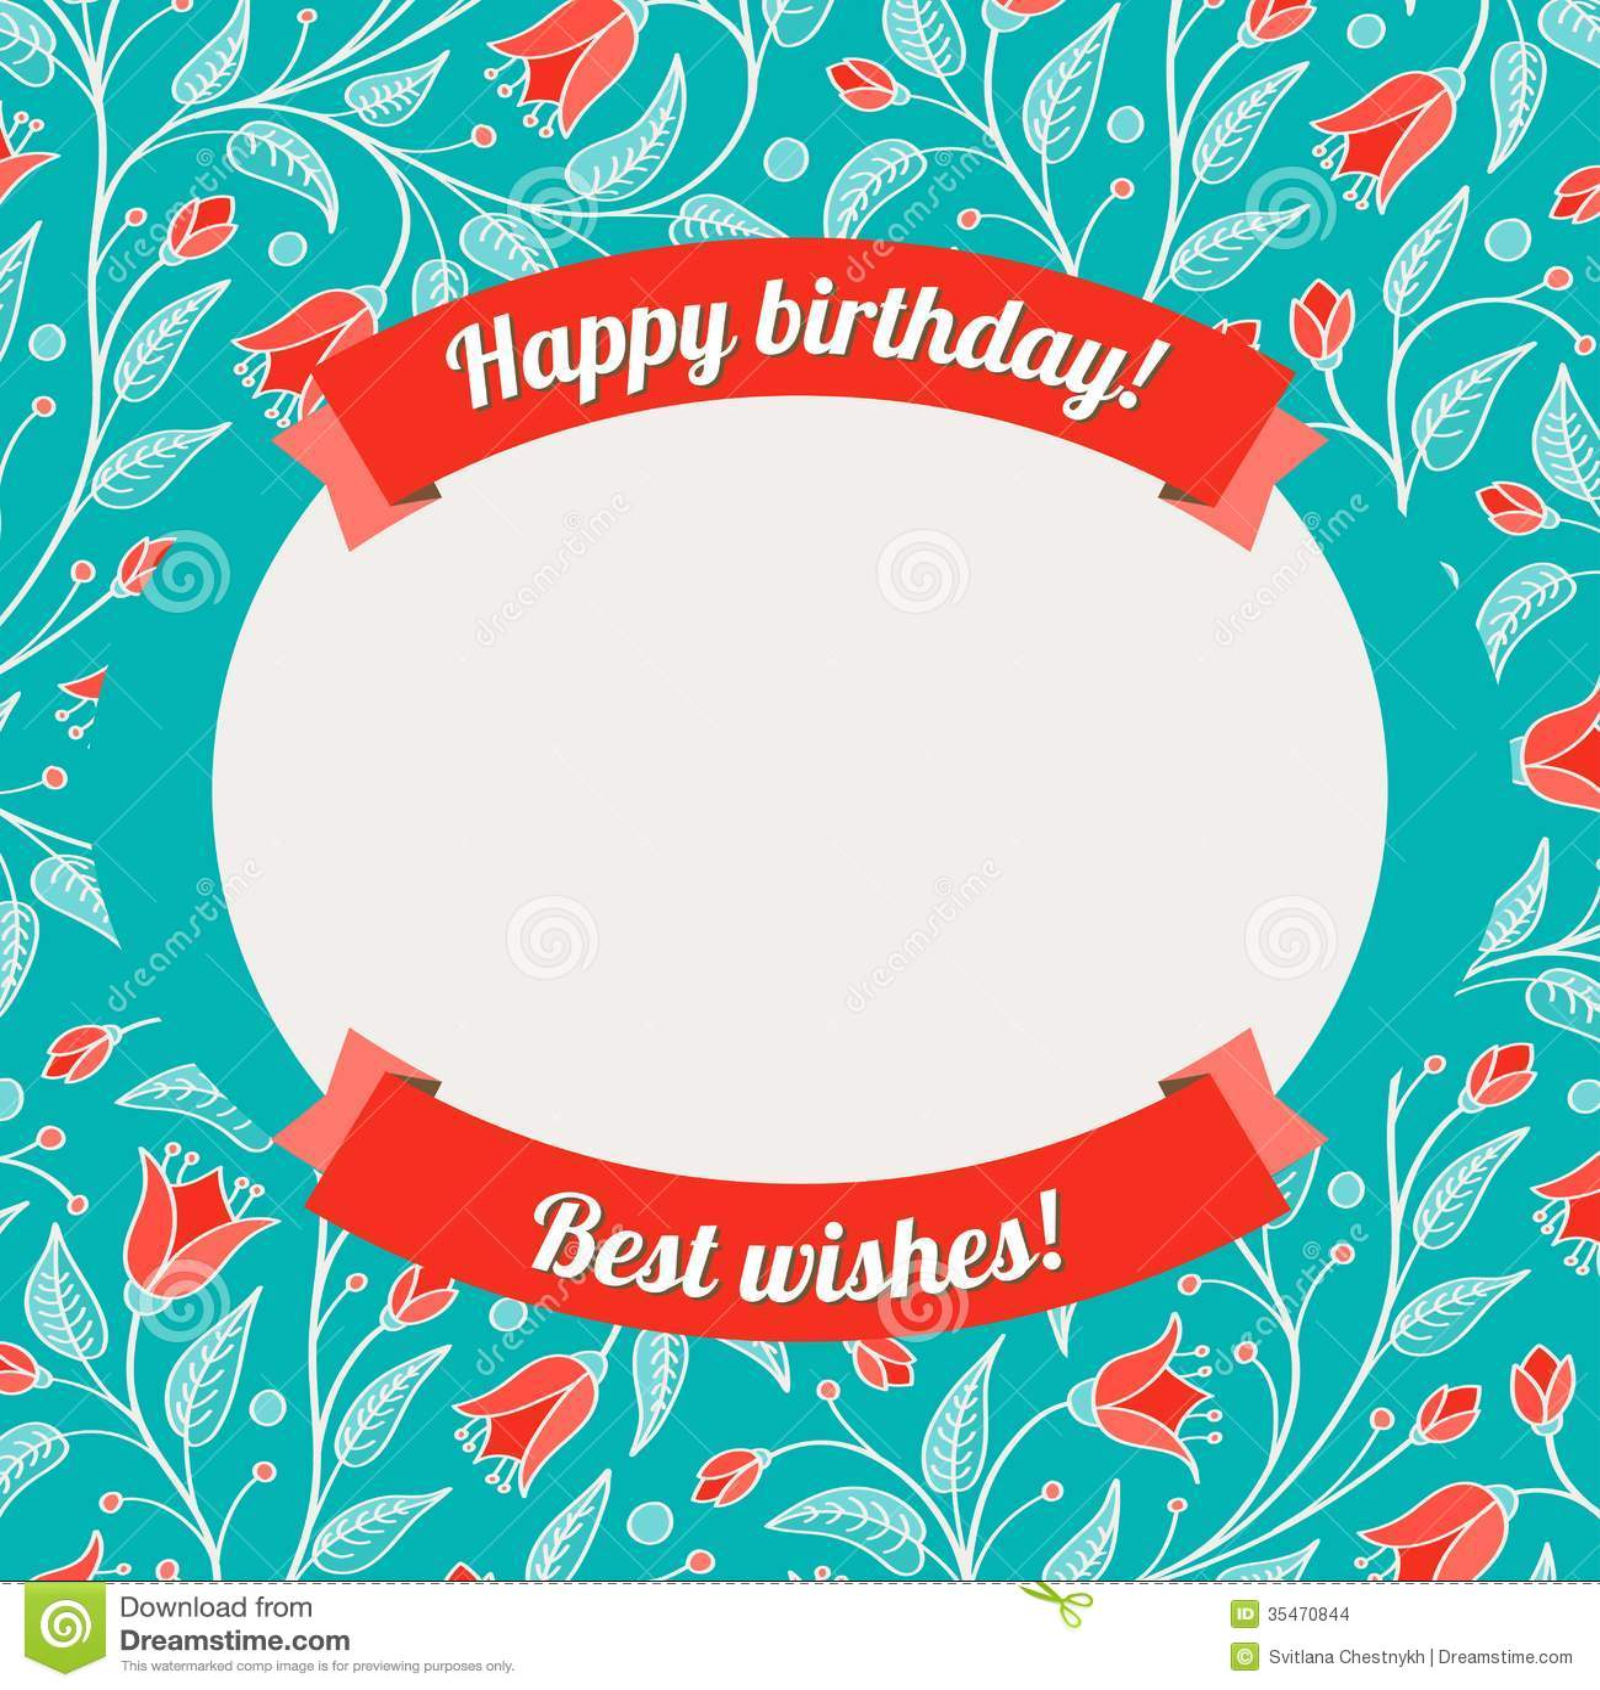 Birthday Card Invitation Template – gangcraft.net